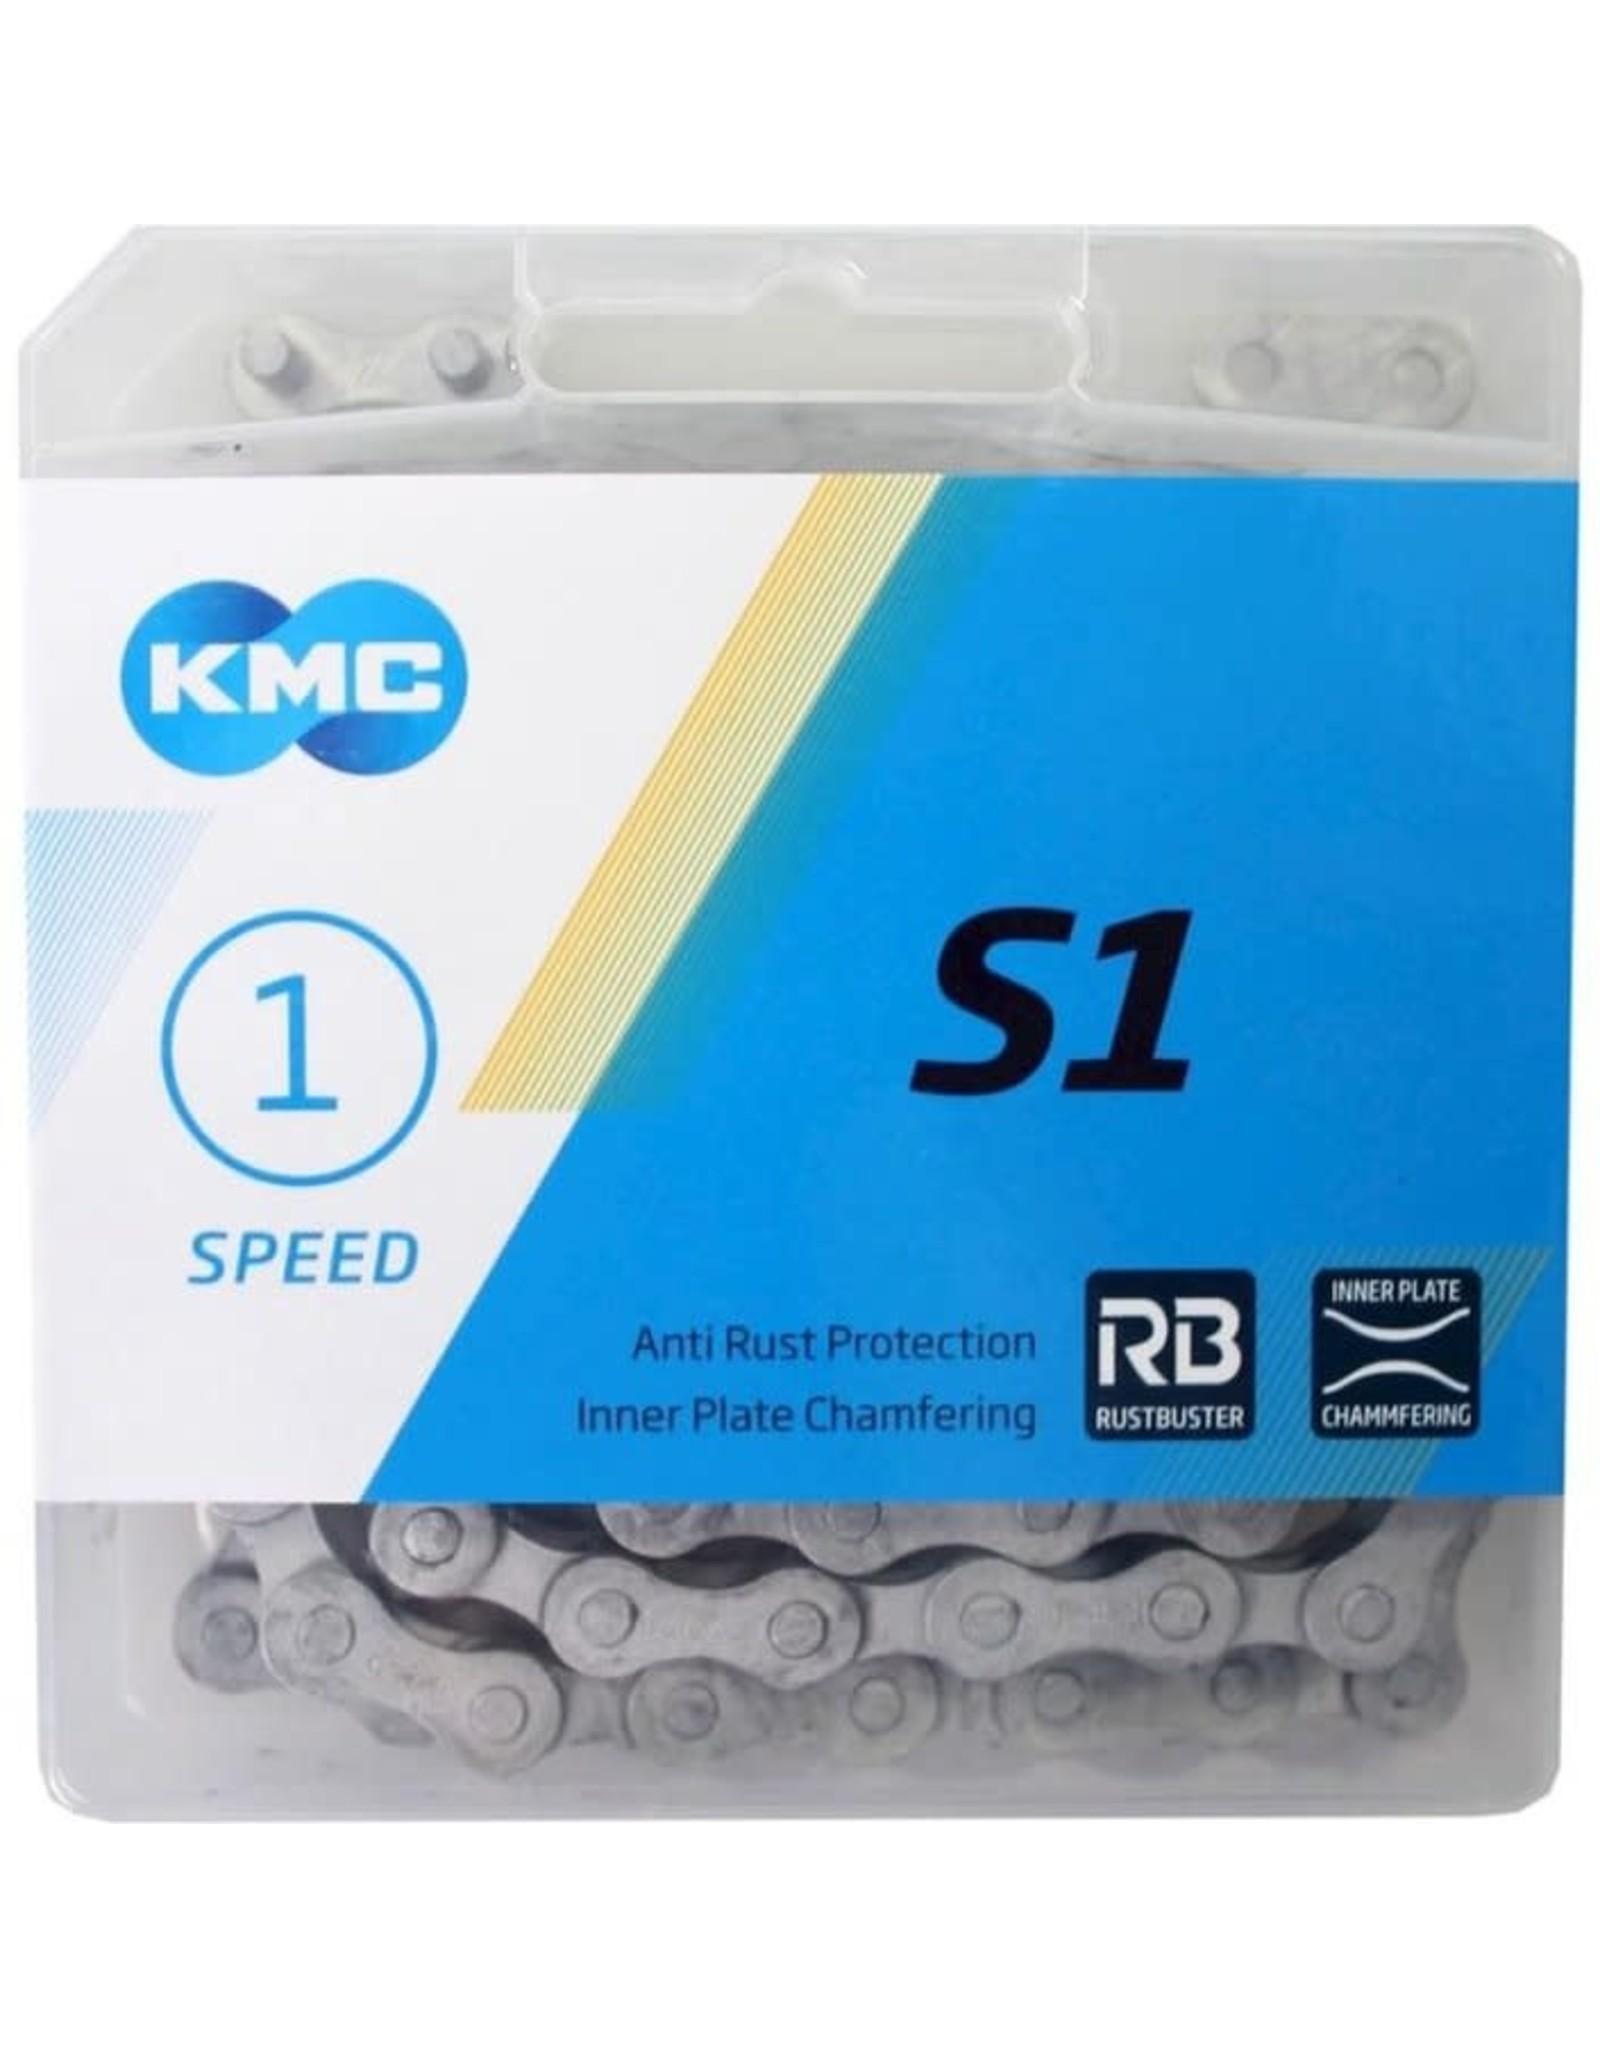 "KMC KMC S1 1/8"" Chain"